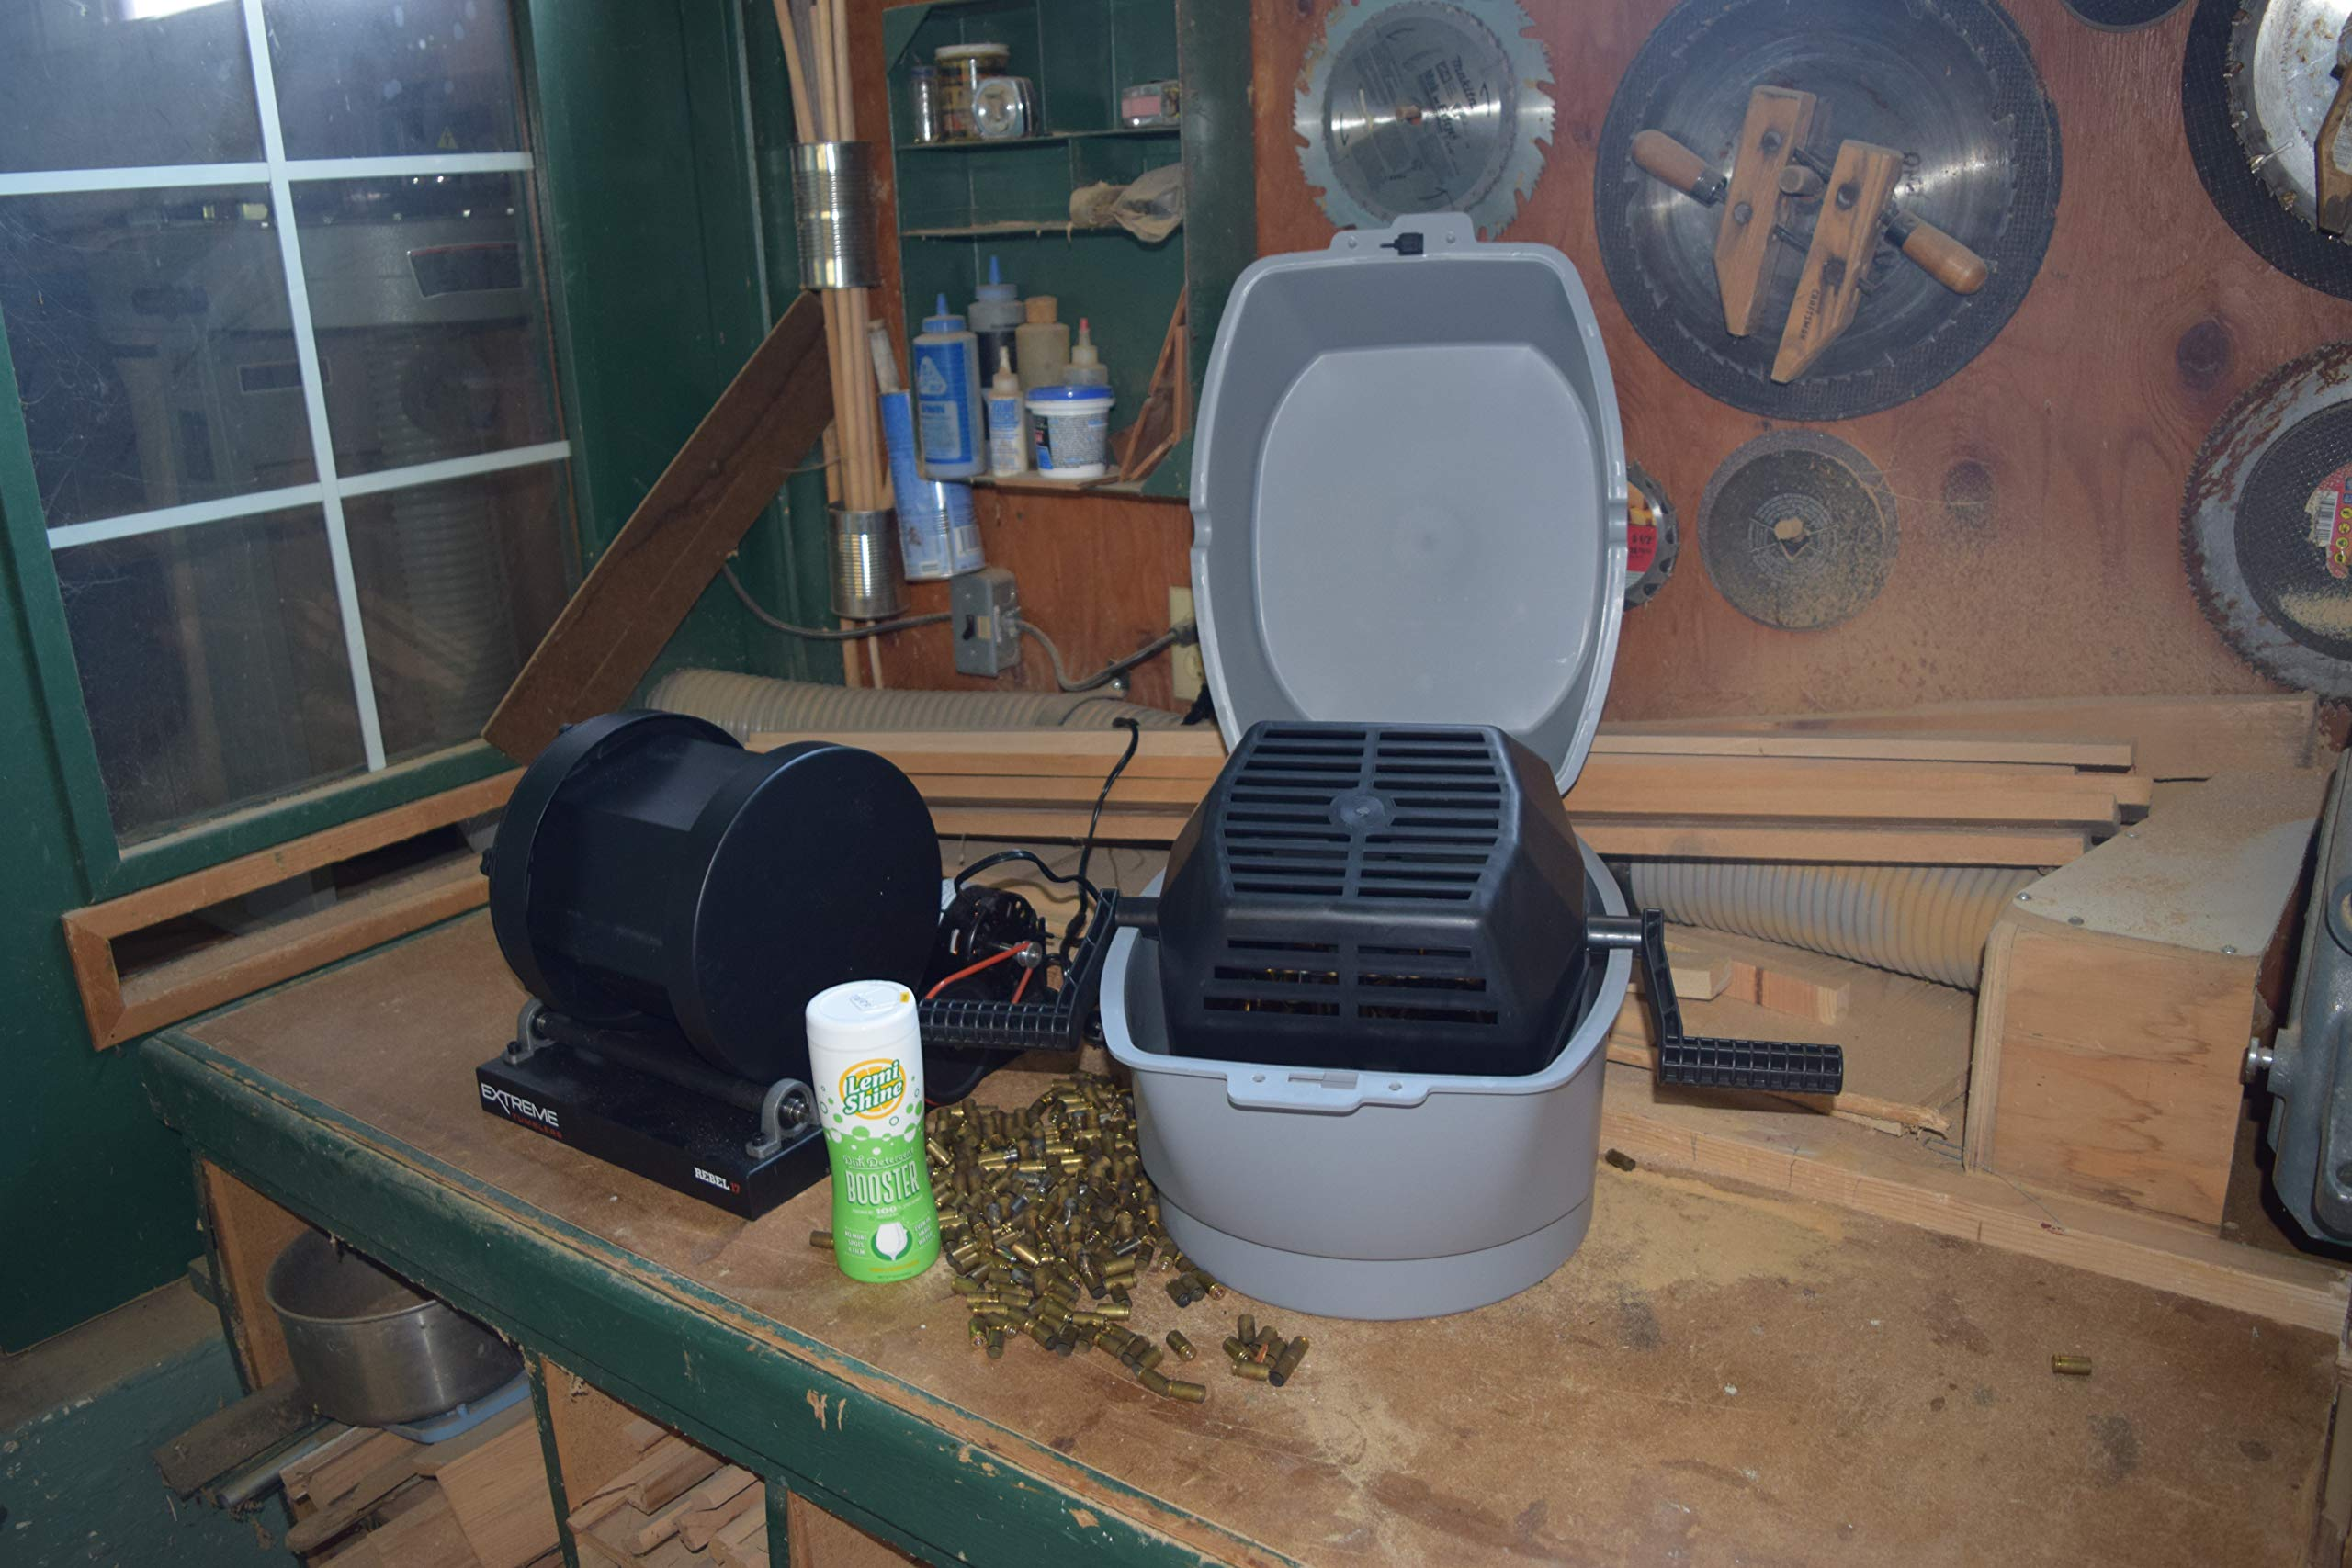 Extreme Tumblers Stainless Steel Deluxe Ammo Reloading Kit Rebel 17 Tumbler - Media Separator - Stainless Steel Media - Detergent by Extreme Tumblers (Image #3)